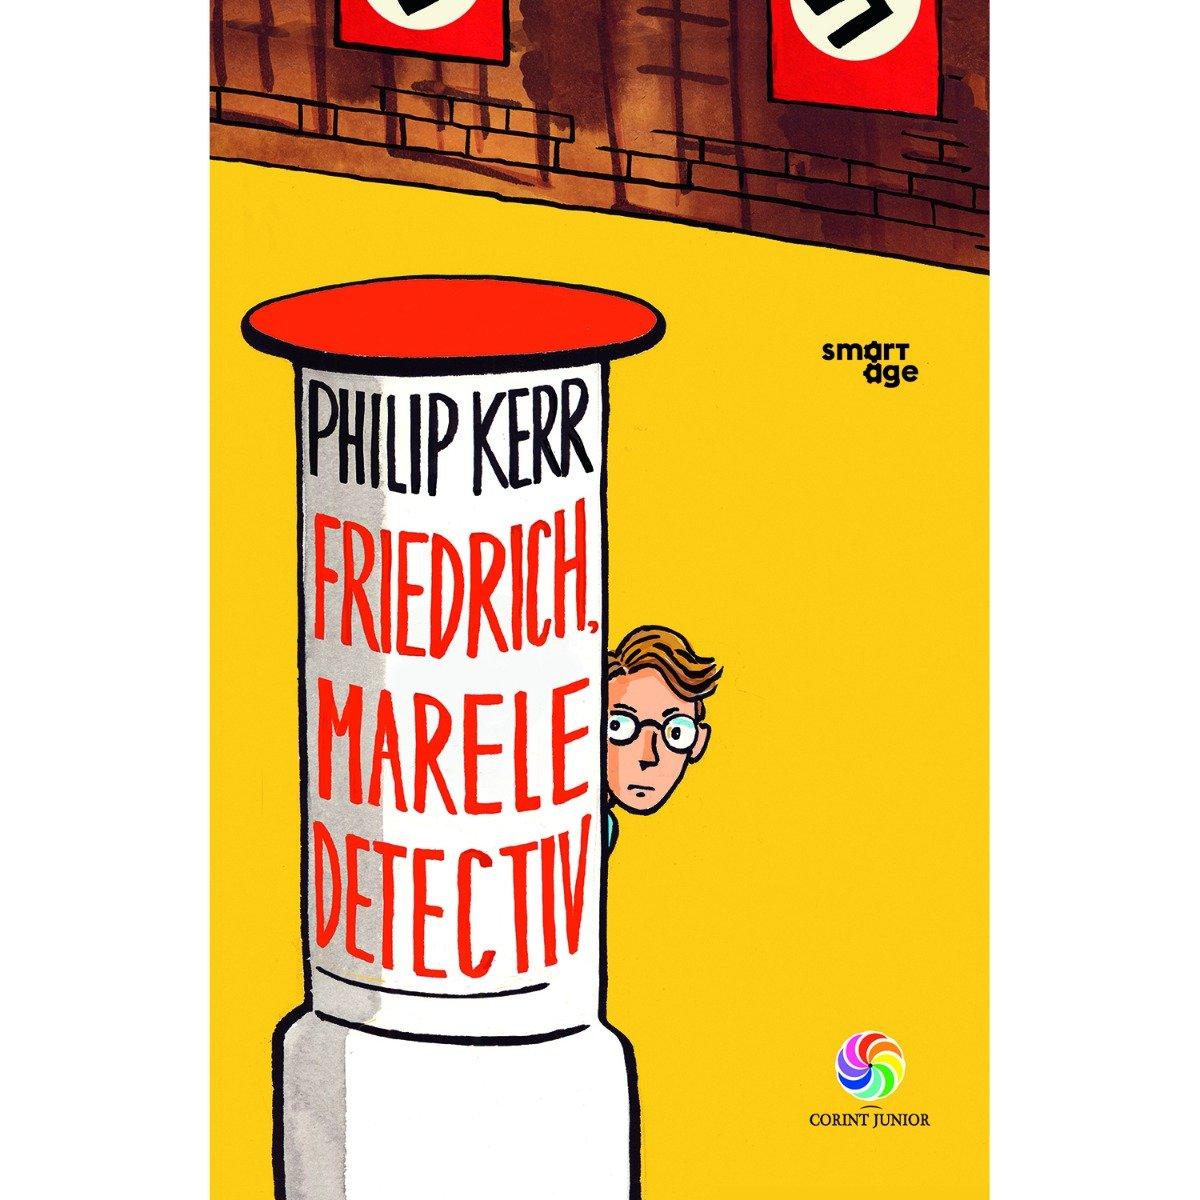 Carte Editura Corint, Friedrich, marele detectiv, Philip Kerr